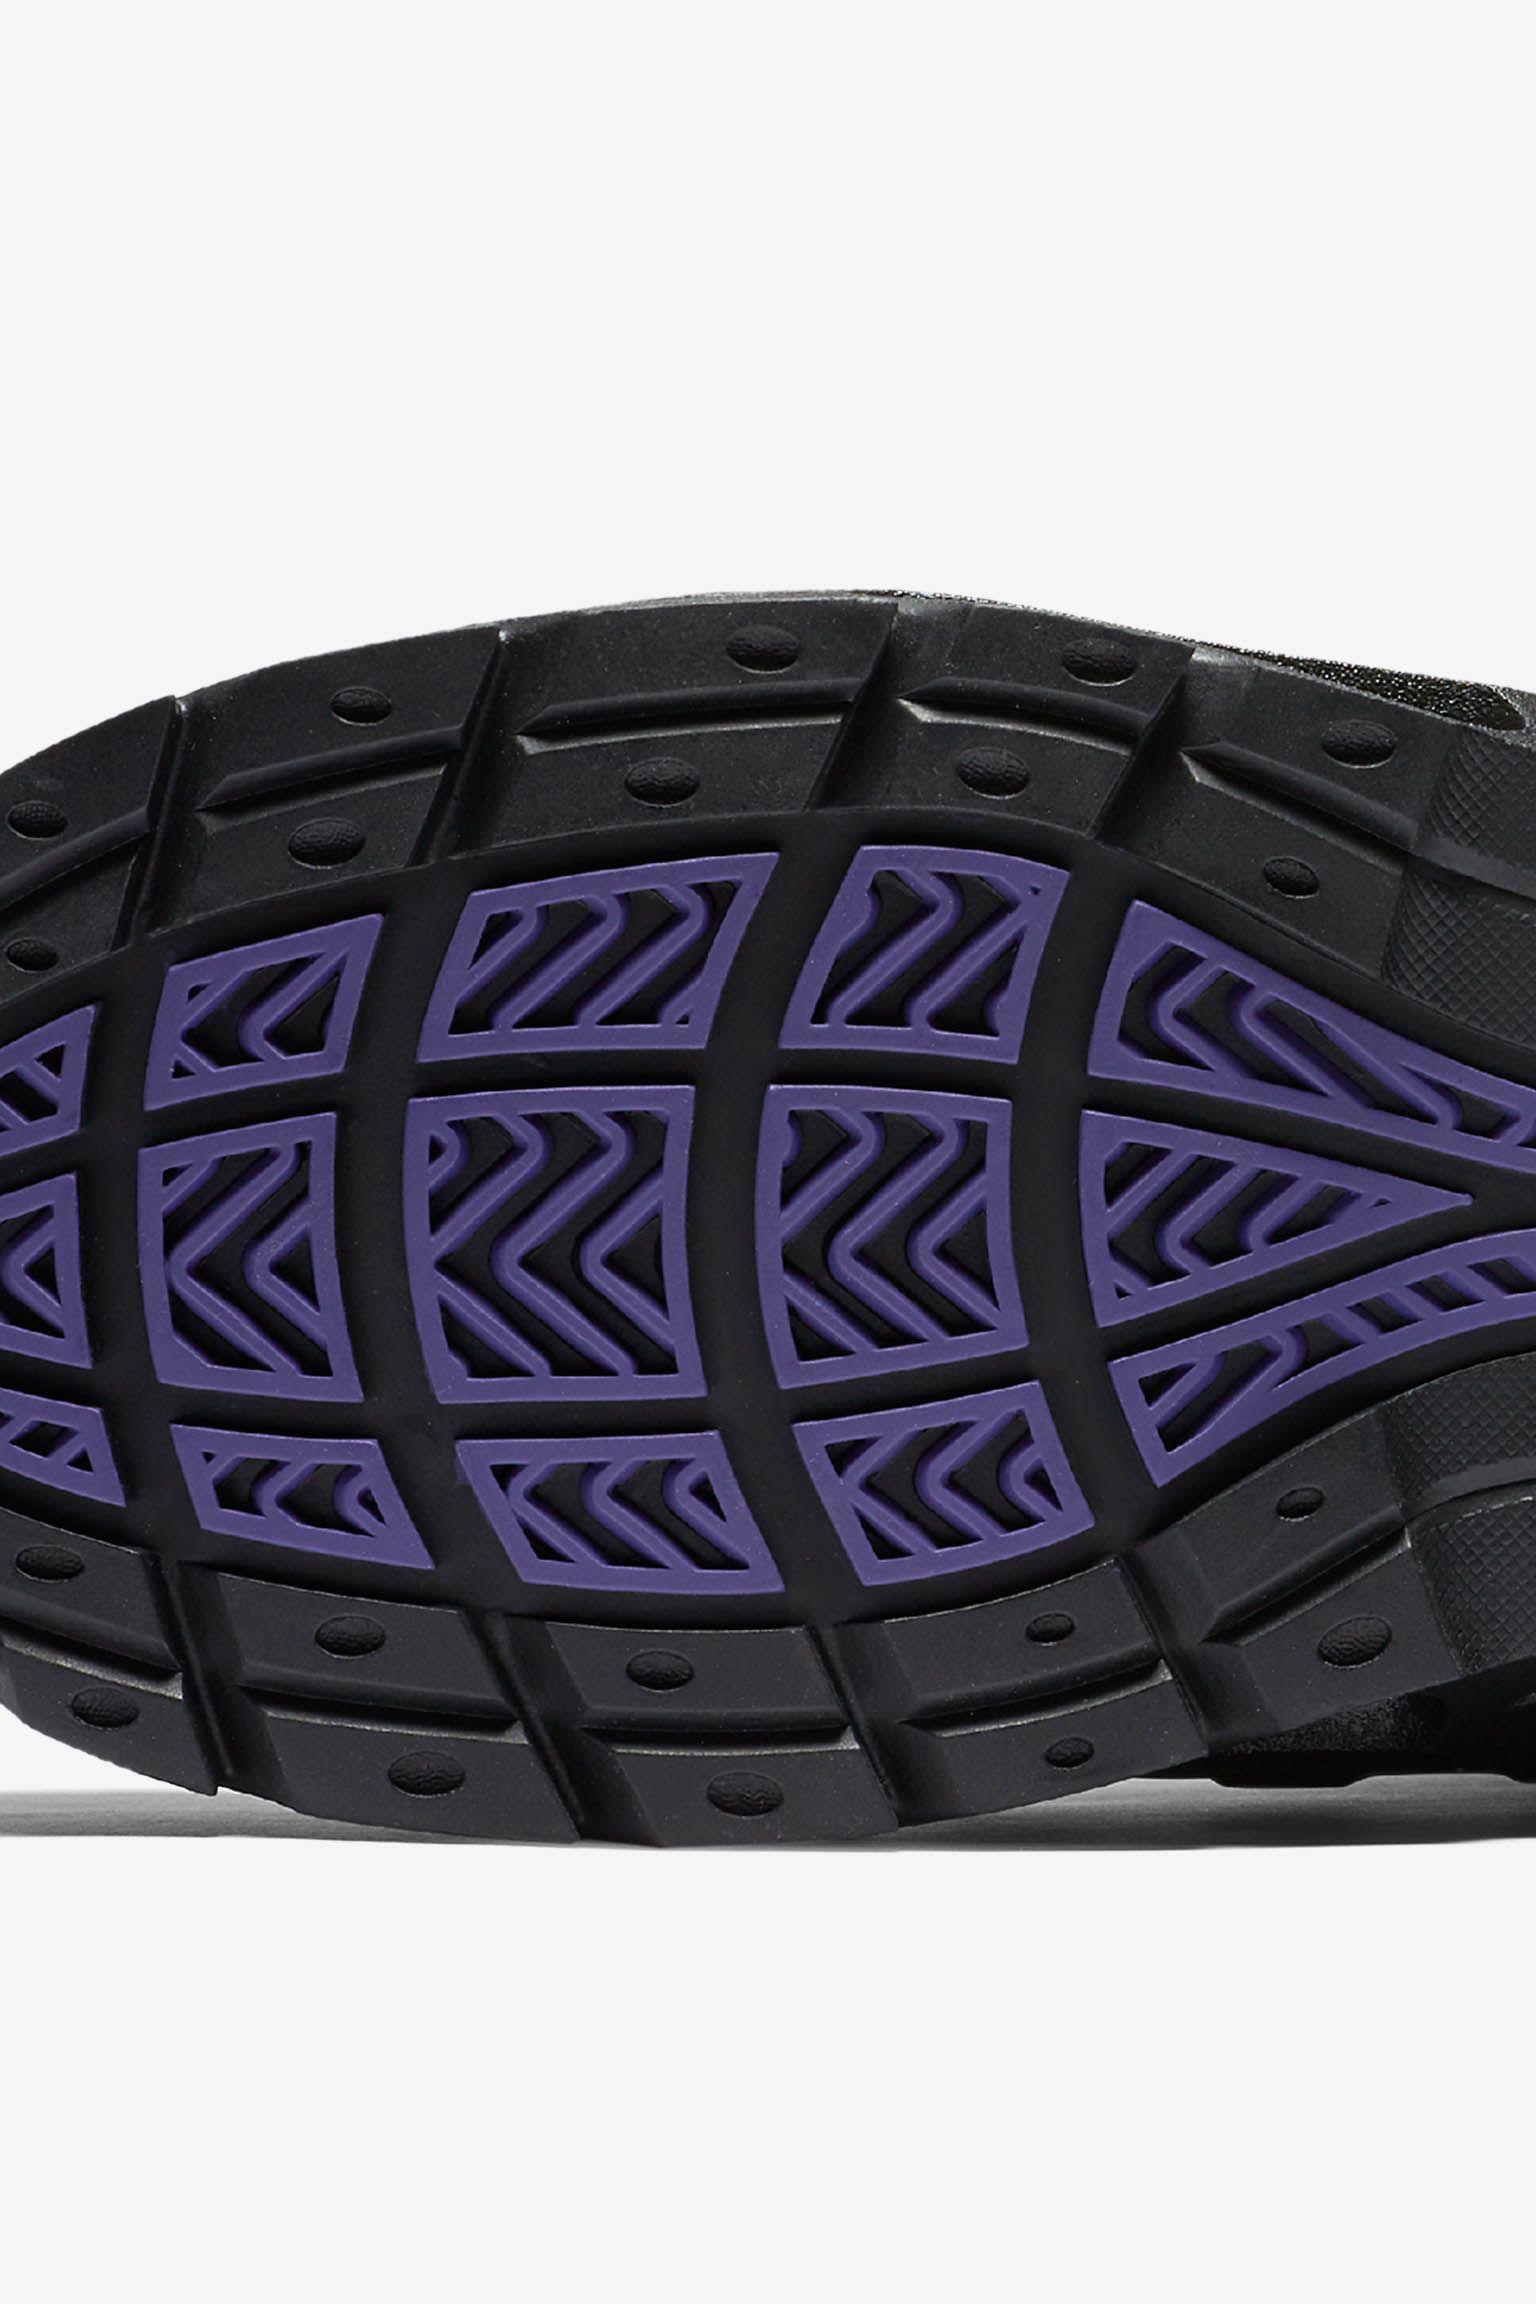 Nike Air Foamdome 'Varsity Purple'